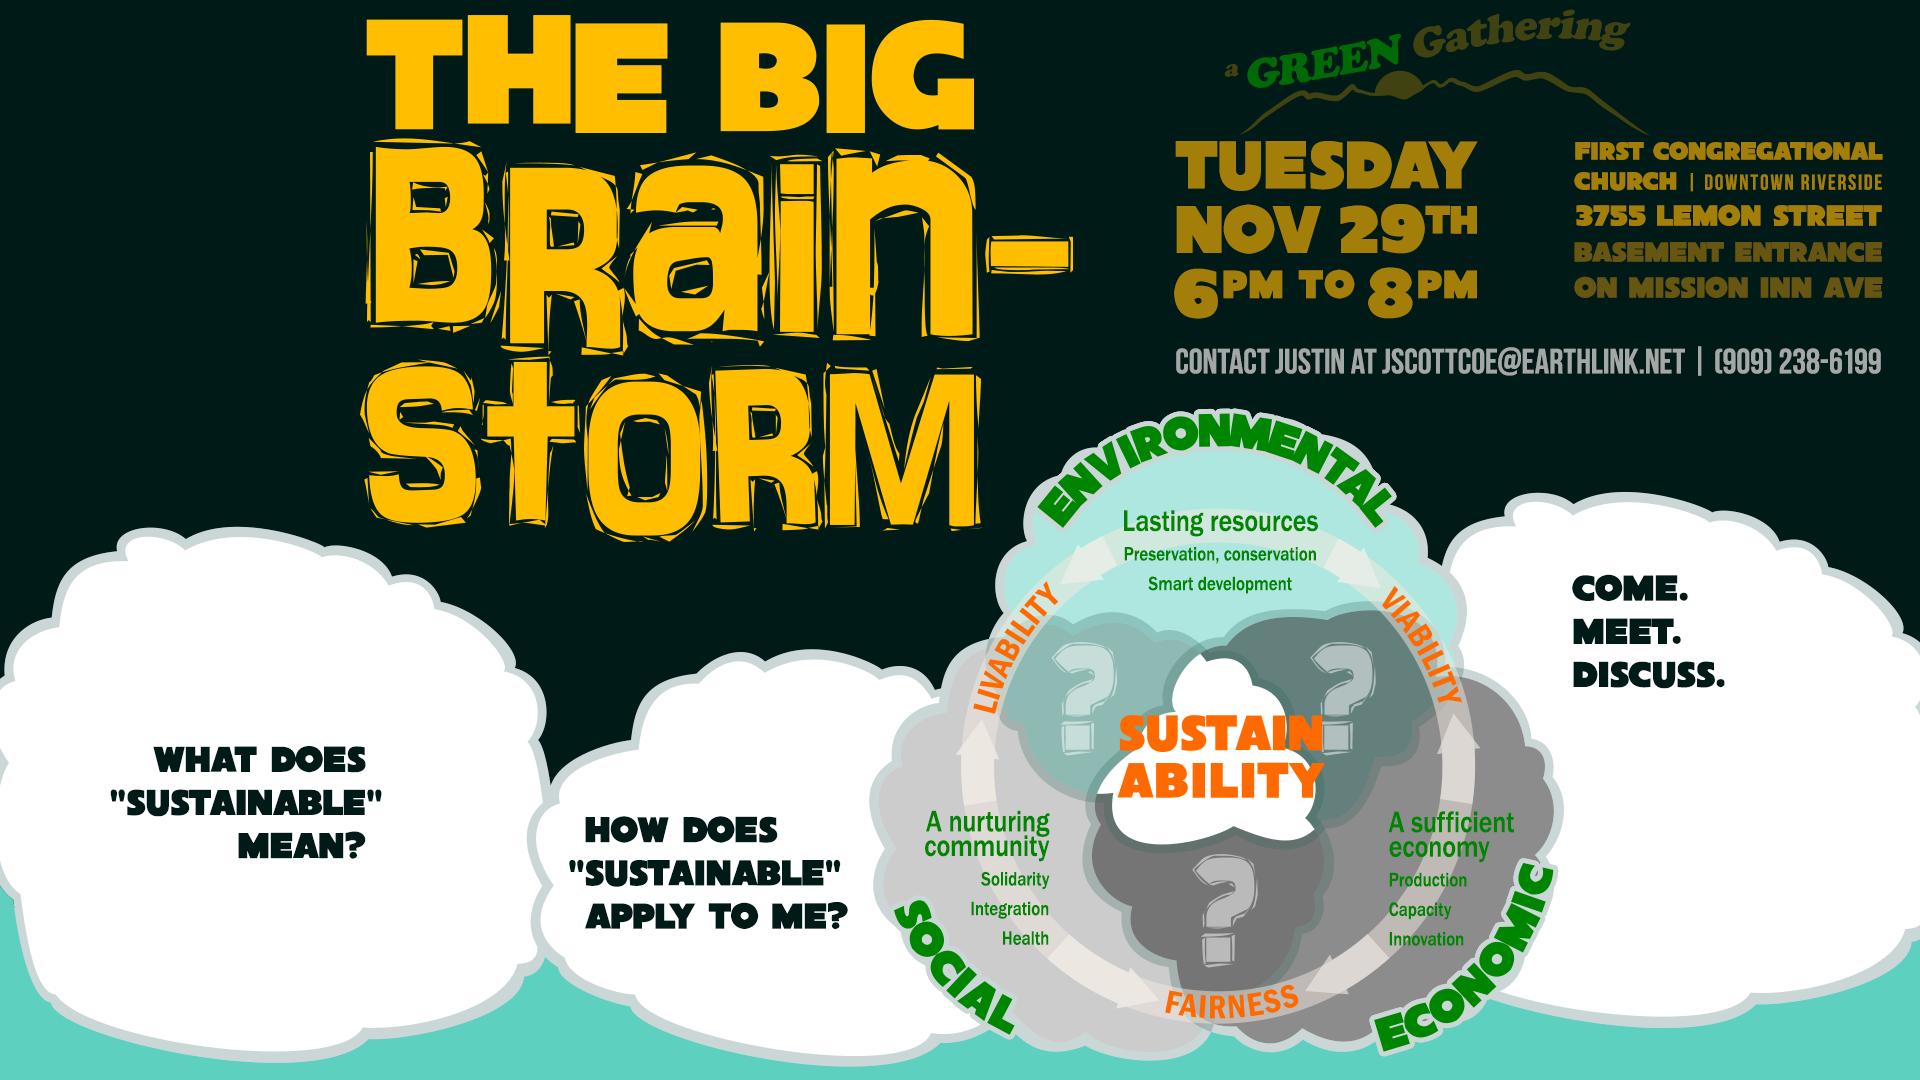 bigbrainstorm-event